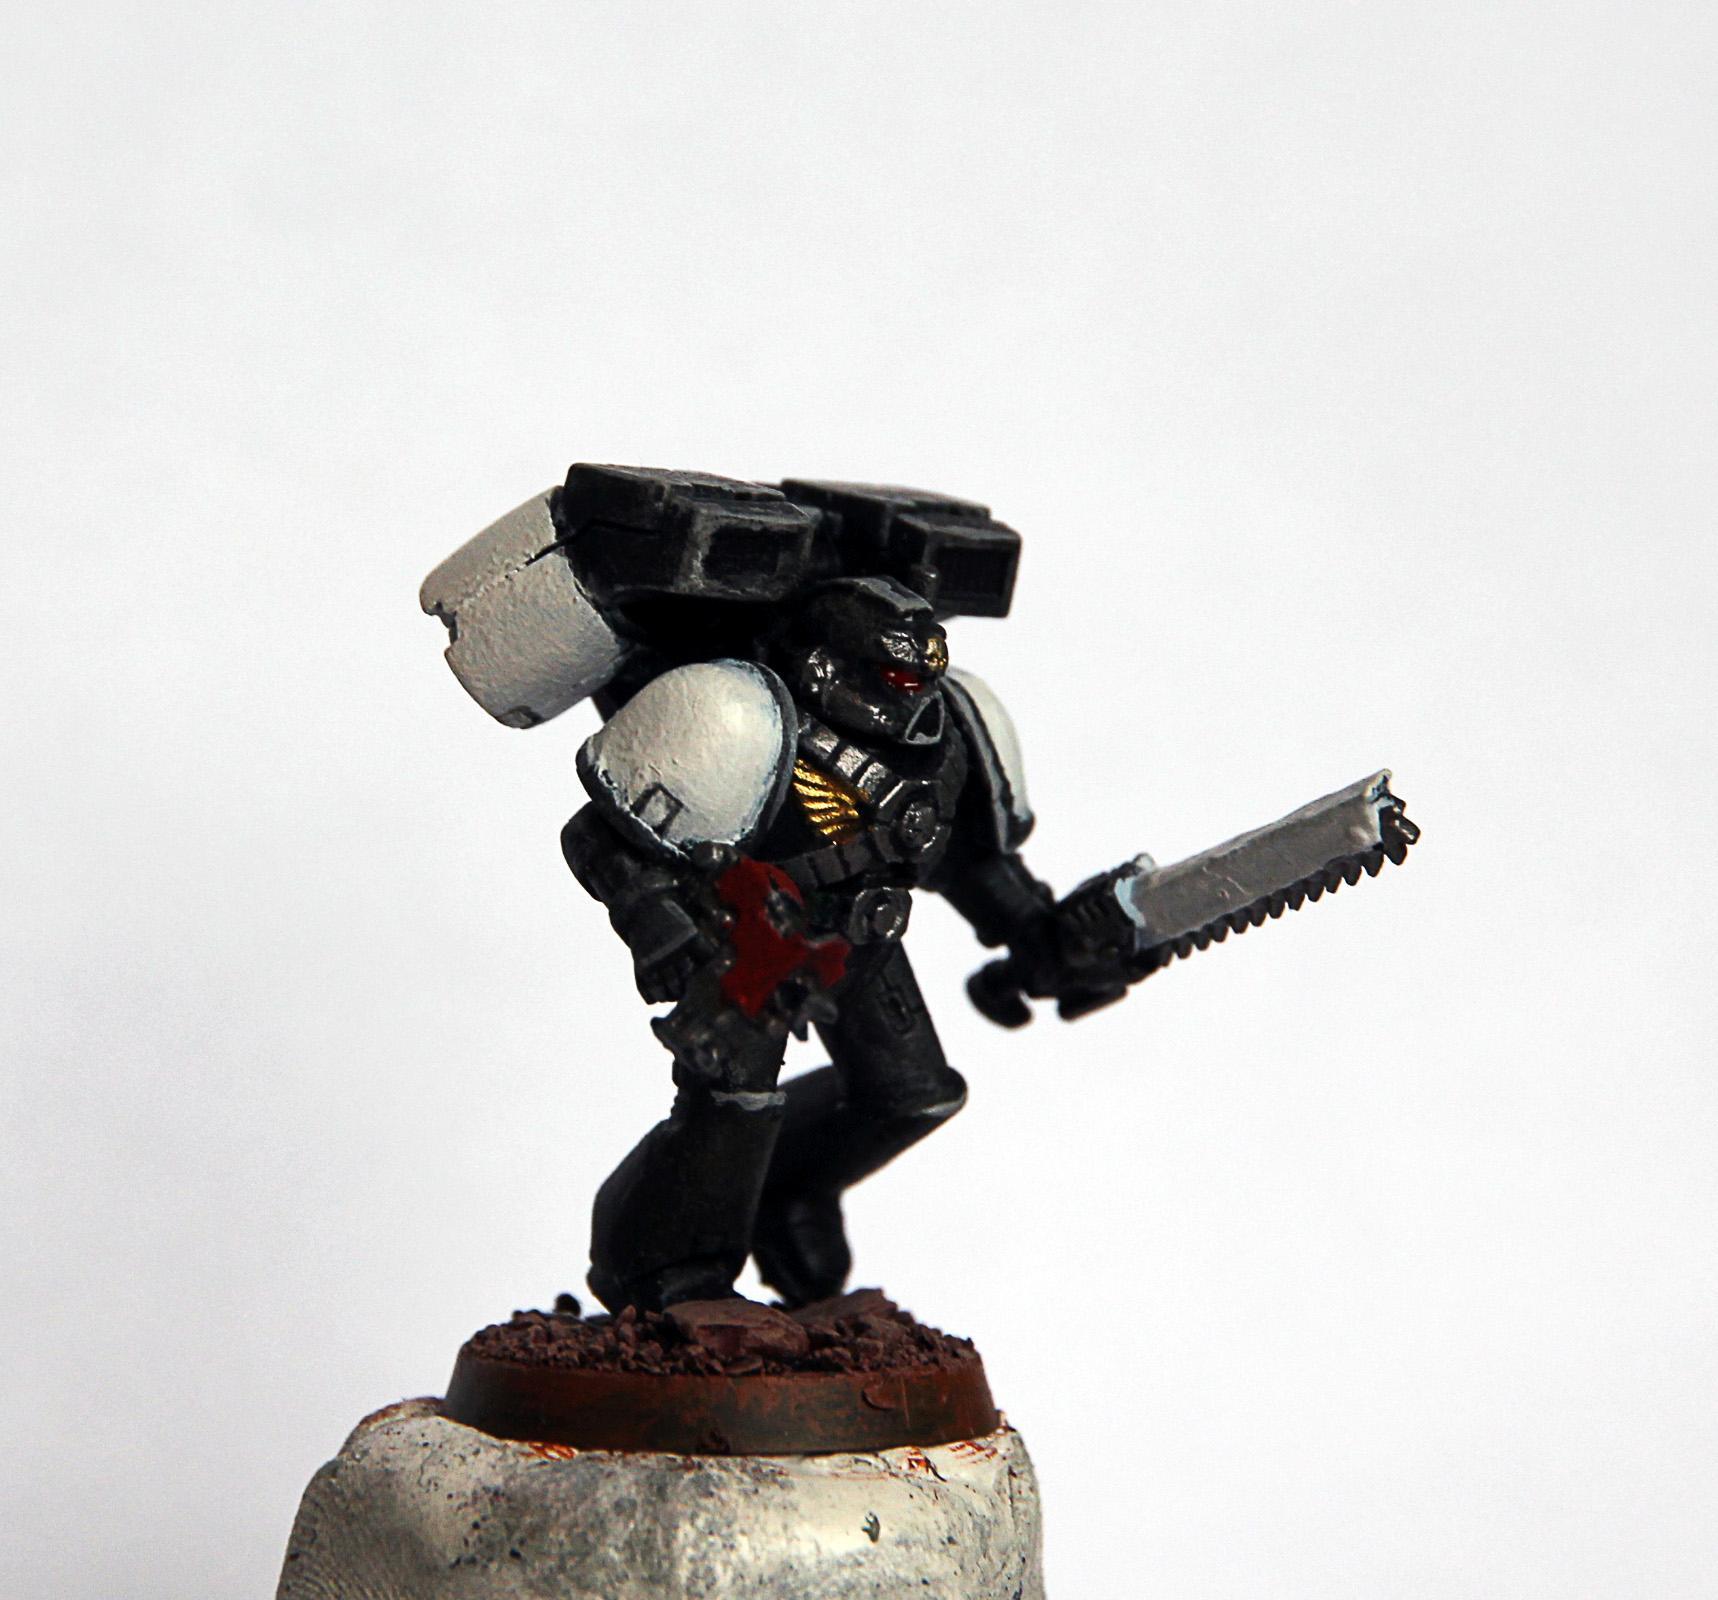 Black Templars, Space Marines, Warhammer 40,000